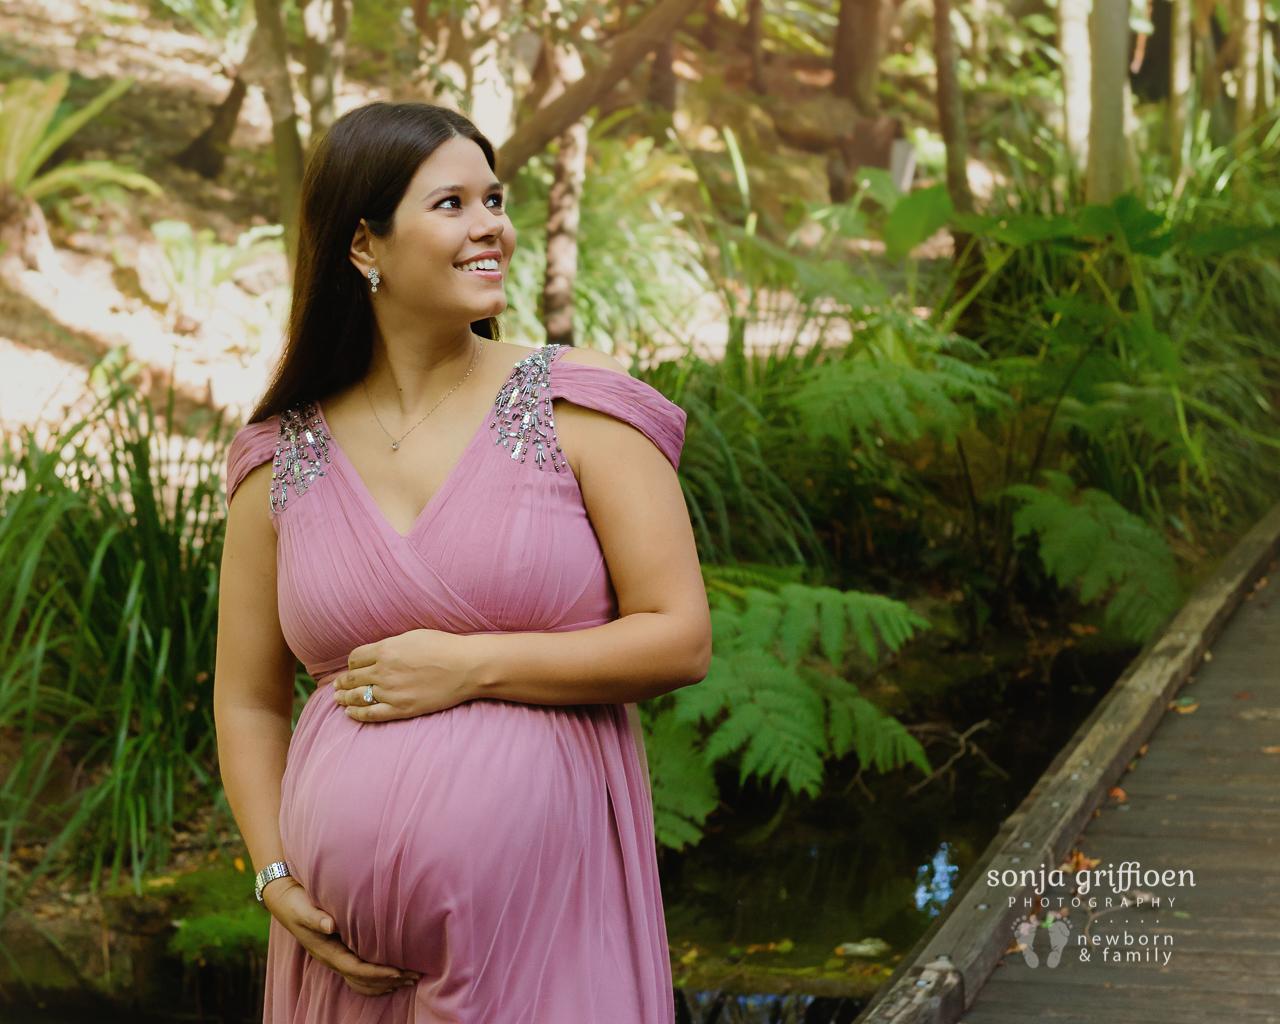 Maria-Maternity-Brisbane-Newborn-Photographer-Sonja-Griffioen-05-2.jpg